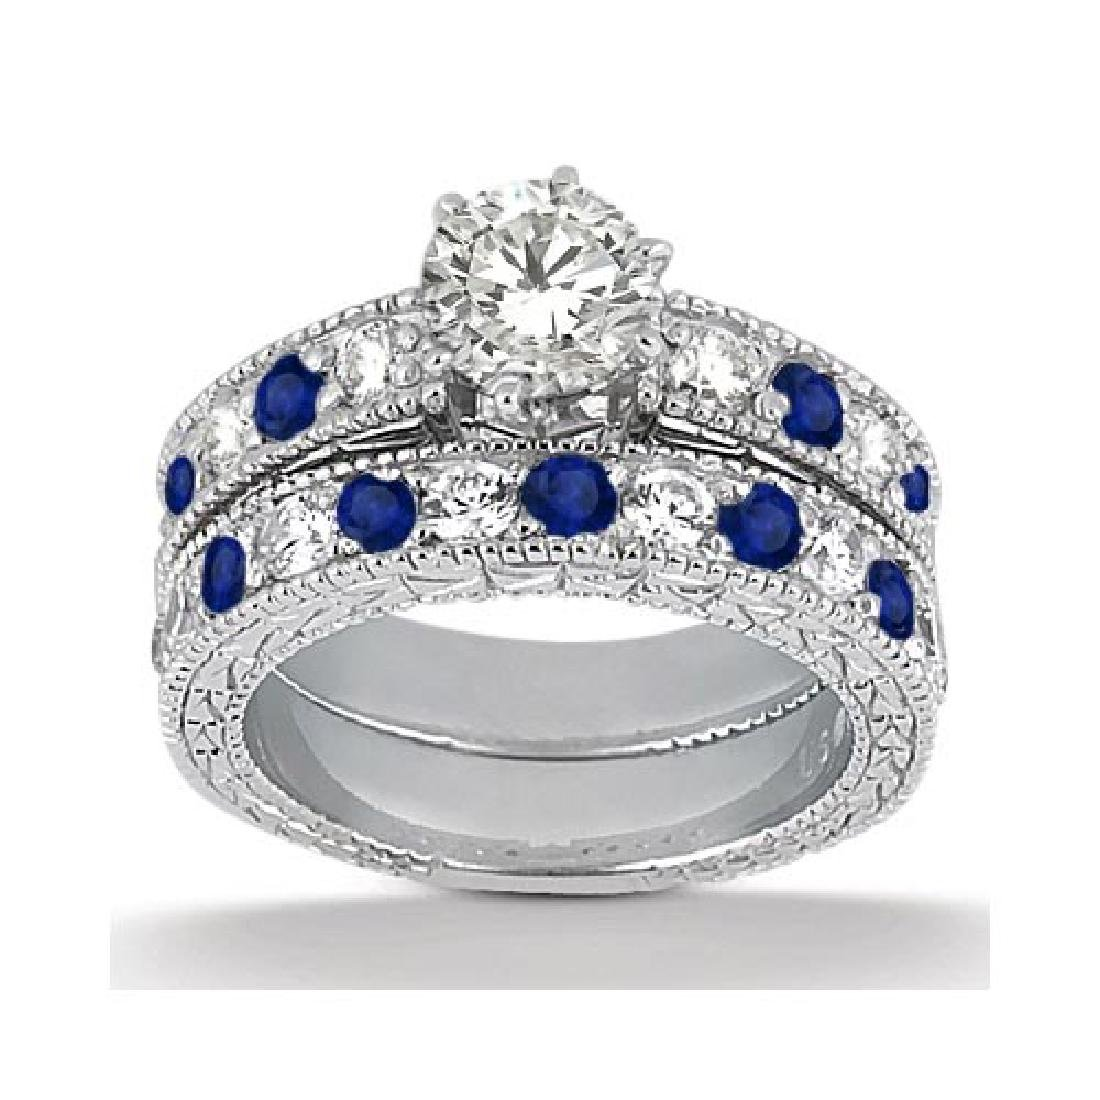 Antique Diamond and Blue Sapphire Bridal Set Palladium